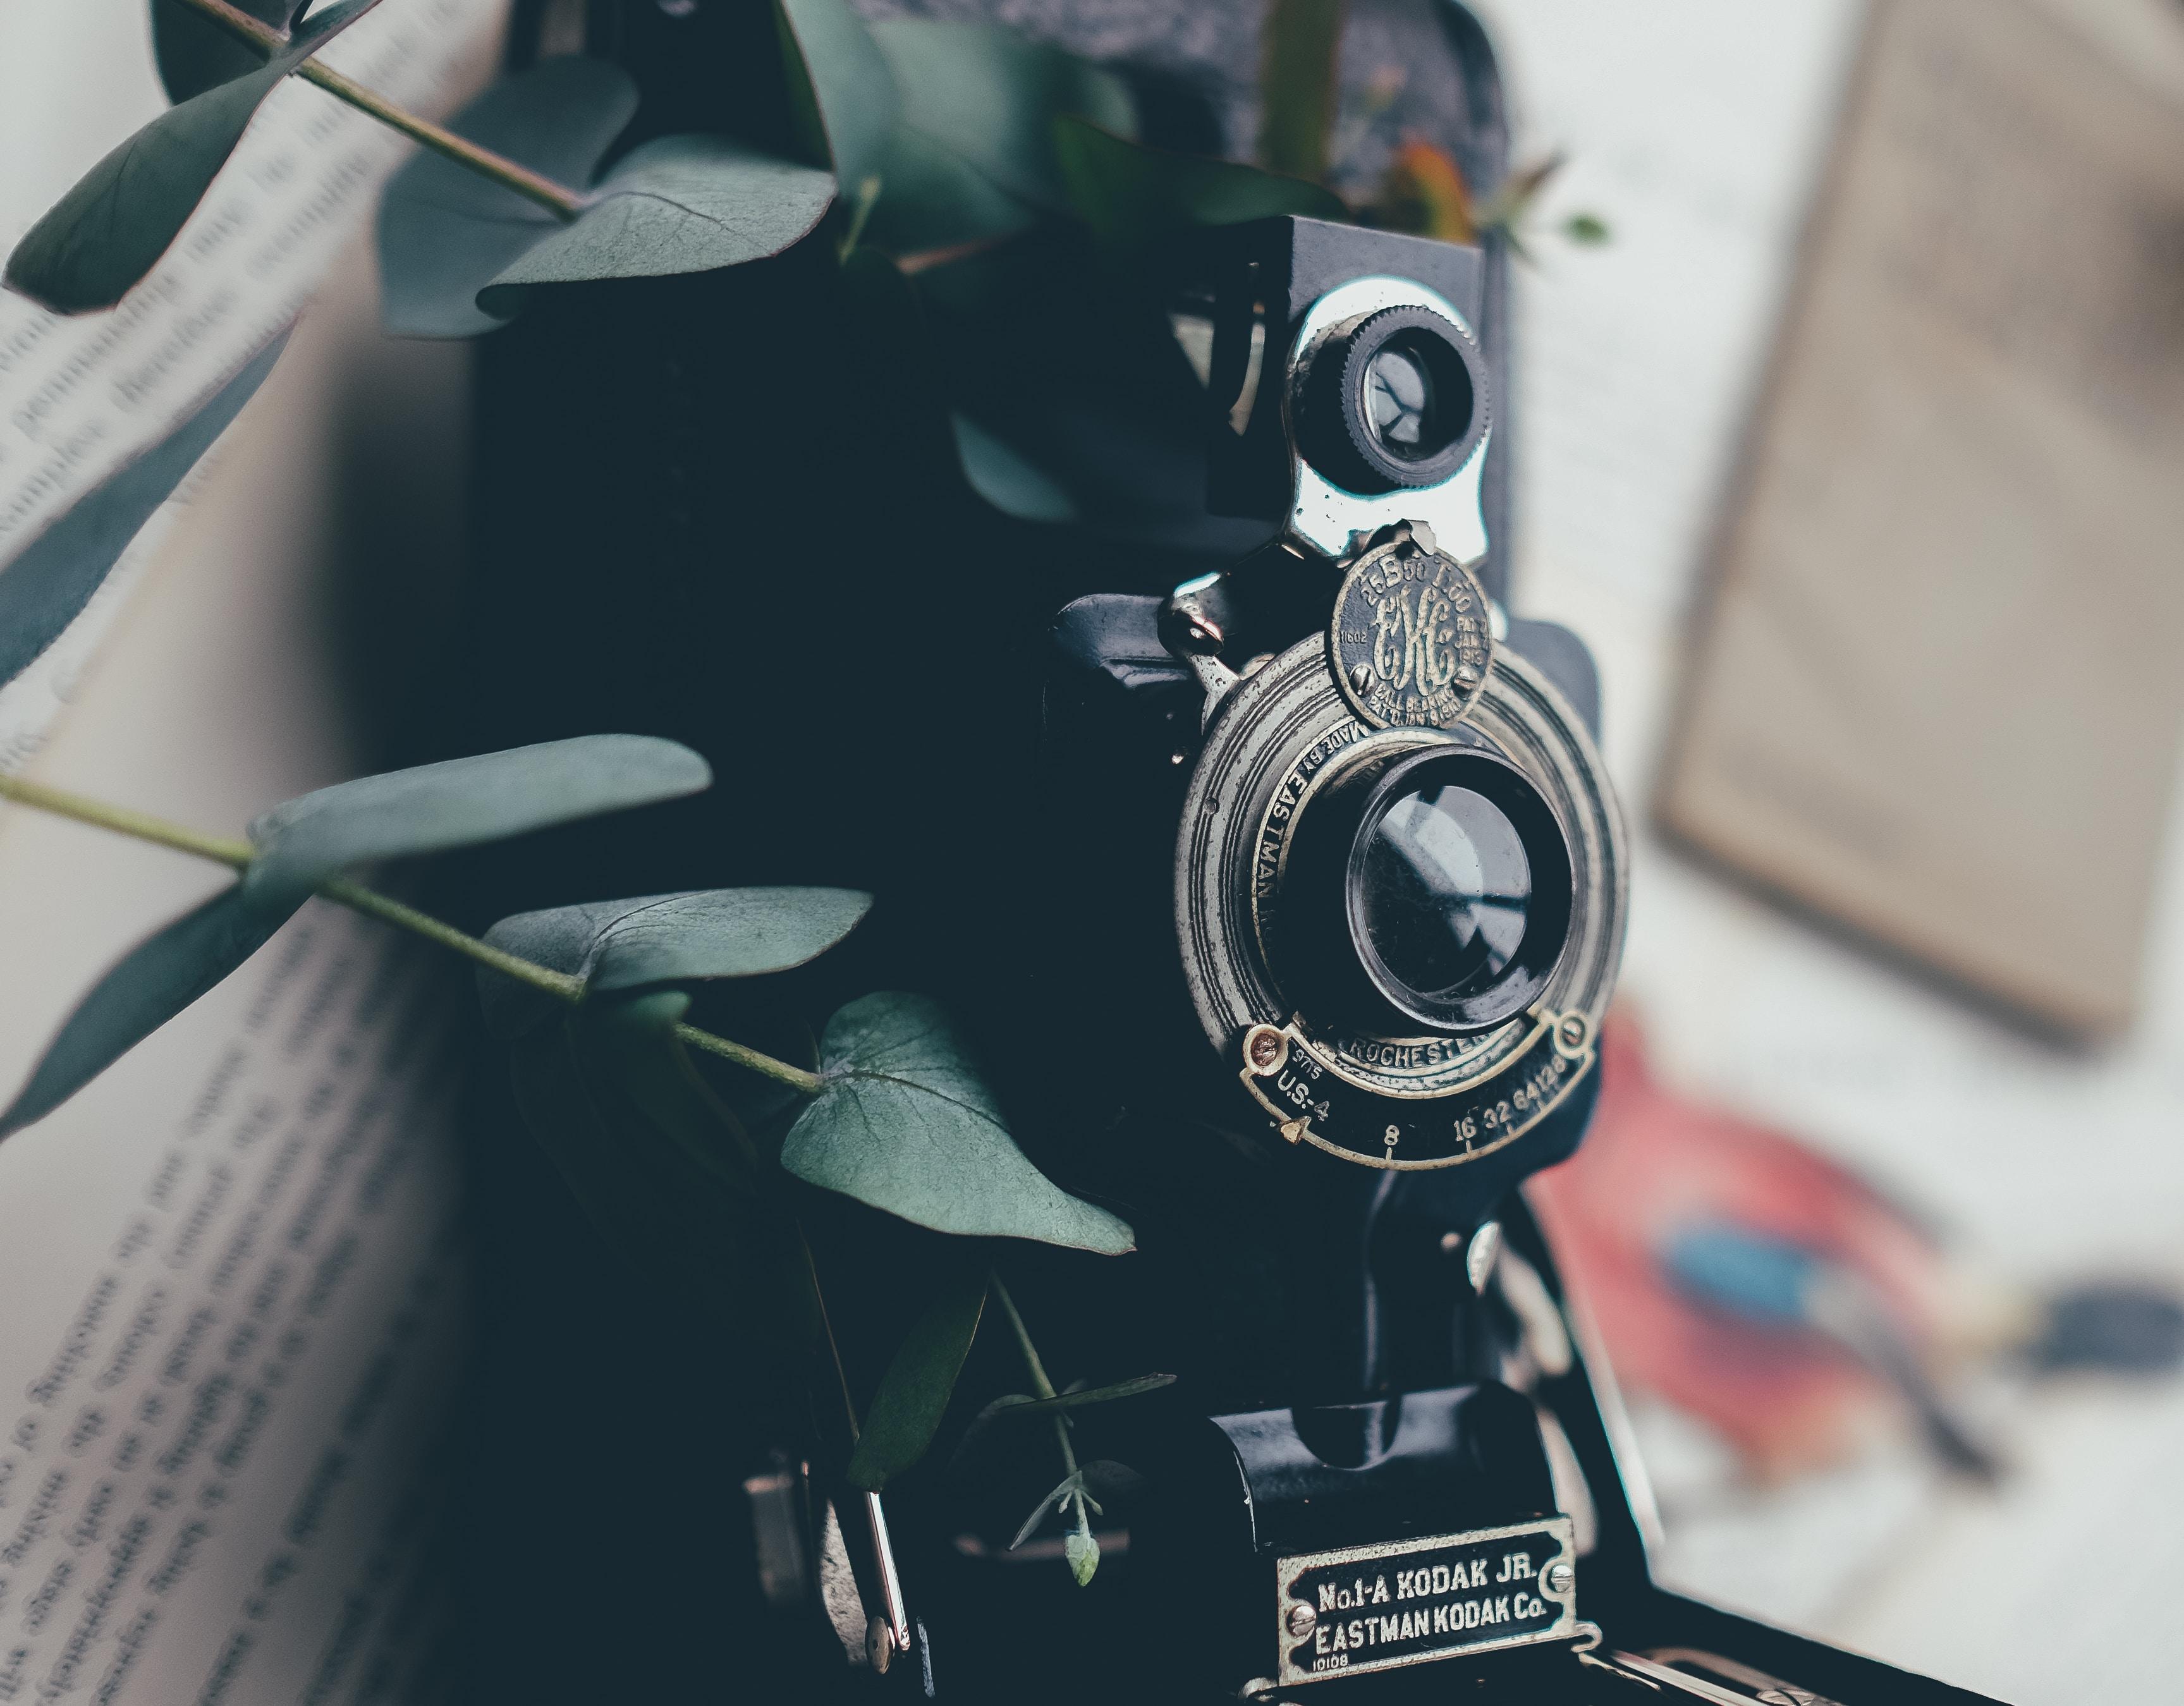 black camera beside green leafed plant